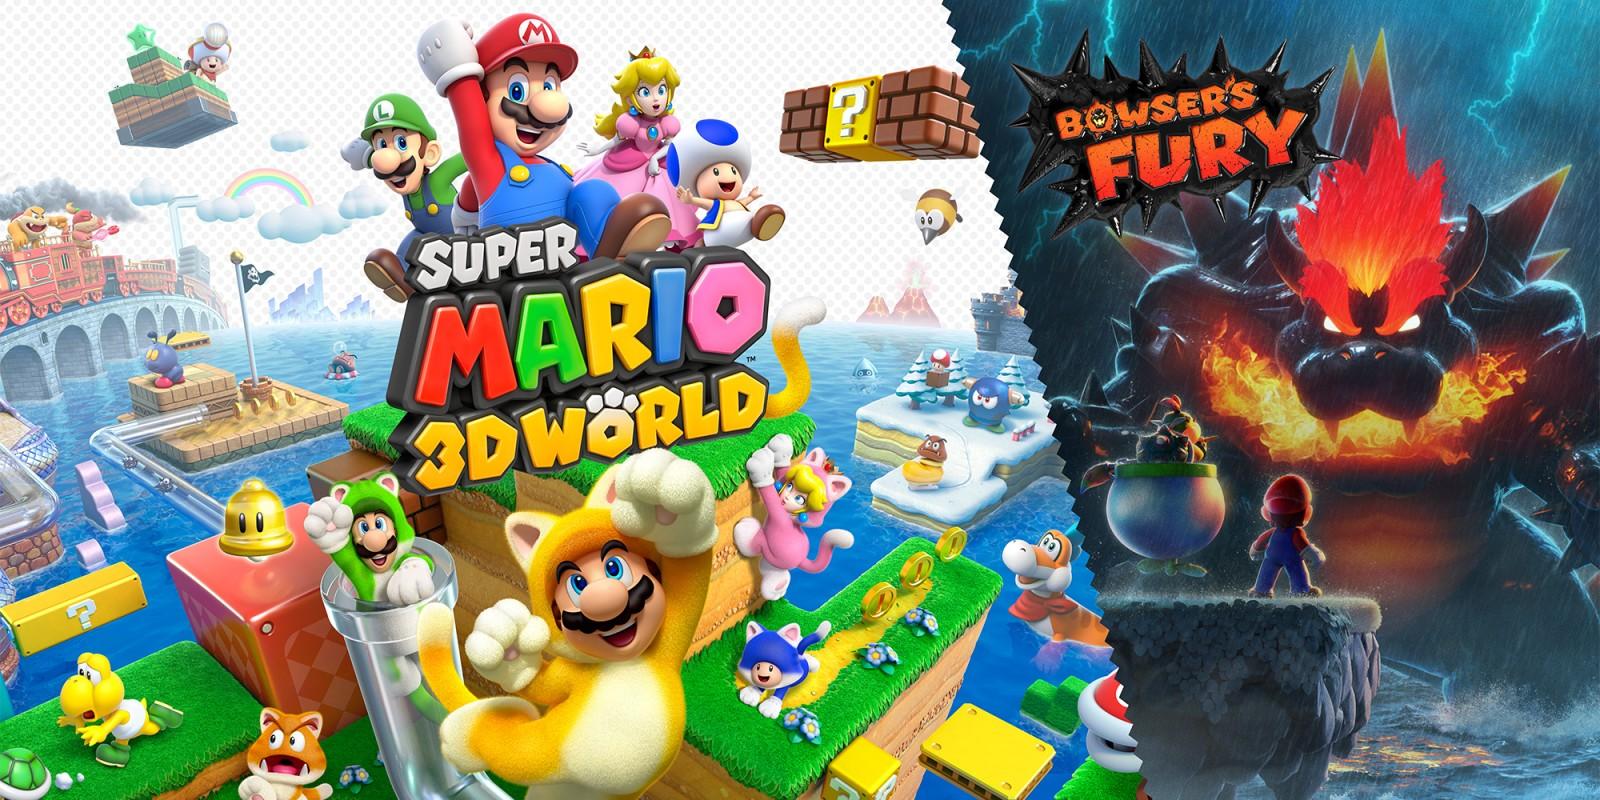 Super-mario-3d-world-bowser-fury-analisi-tecnica